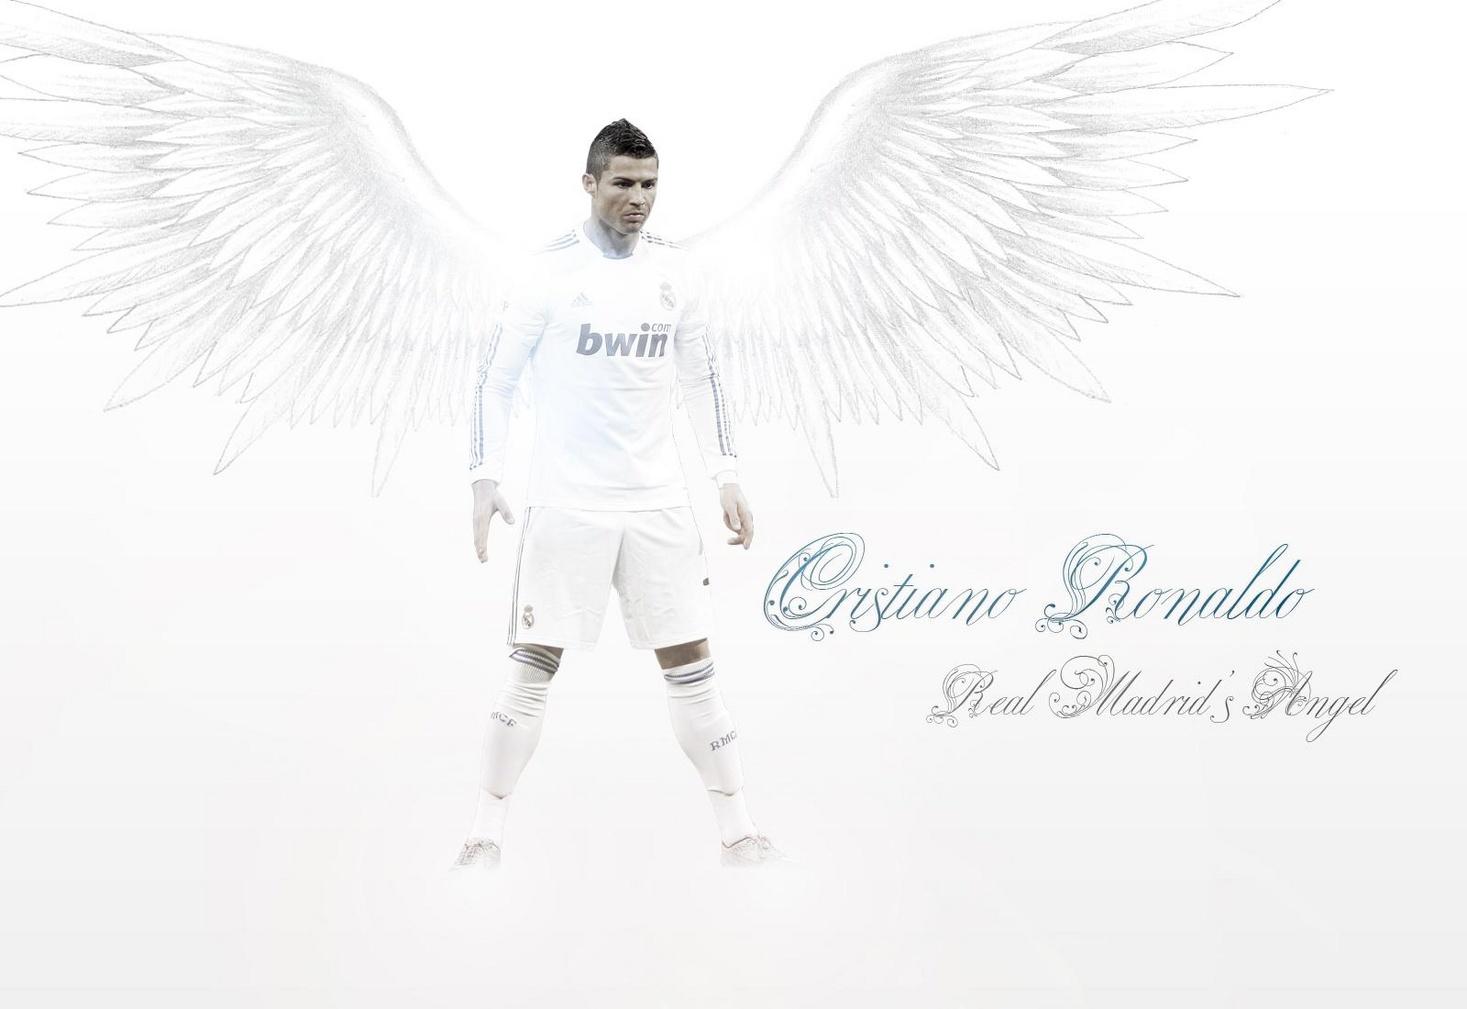 http://3.bp.blogspot.com/-LJ-tlNHitDg/Tpsb70xfkjI/AAAAAAAAASc/9rrzAiMiOss/s1600/cristiano+ronaldo+wallpaper-newwallpaper-2011.blogspot.com-Cristiano-Ronaldo-Wallpaper-2011-49.jpg